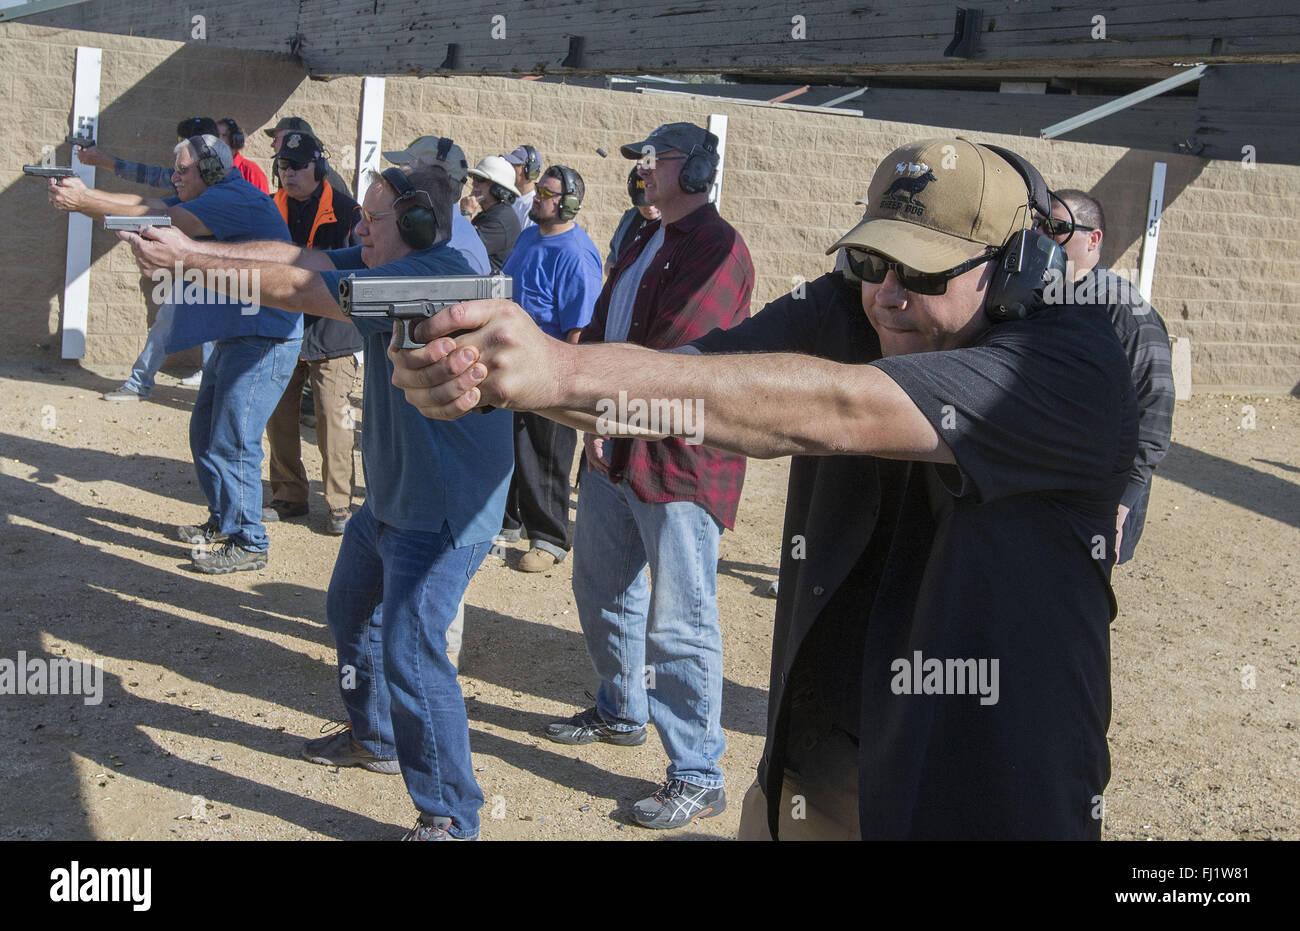 Chino, California, USA. 27th Feb, 2016. Steven Pappas, right, of La Palma, Ca. keeps his shooting skills sharp. - Stock Image